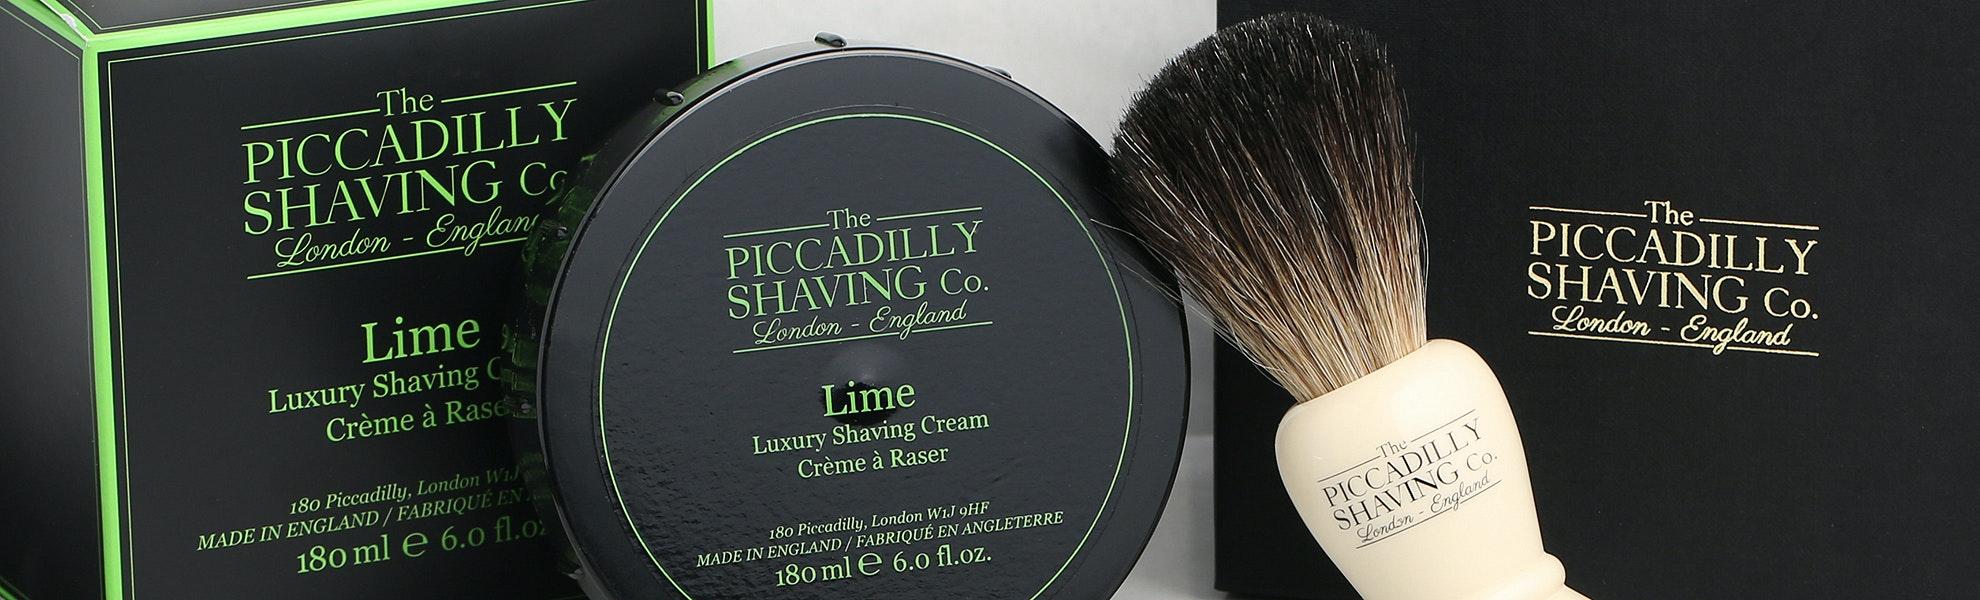 Piccadilly Shaving Co. Shave Set